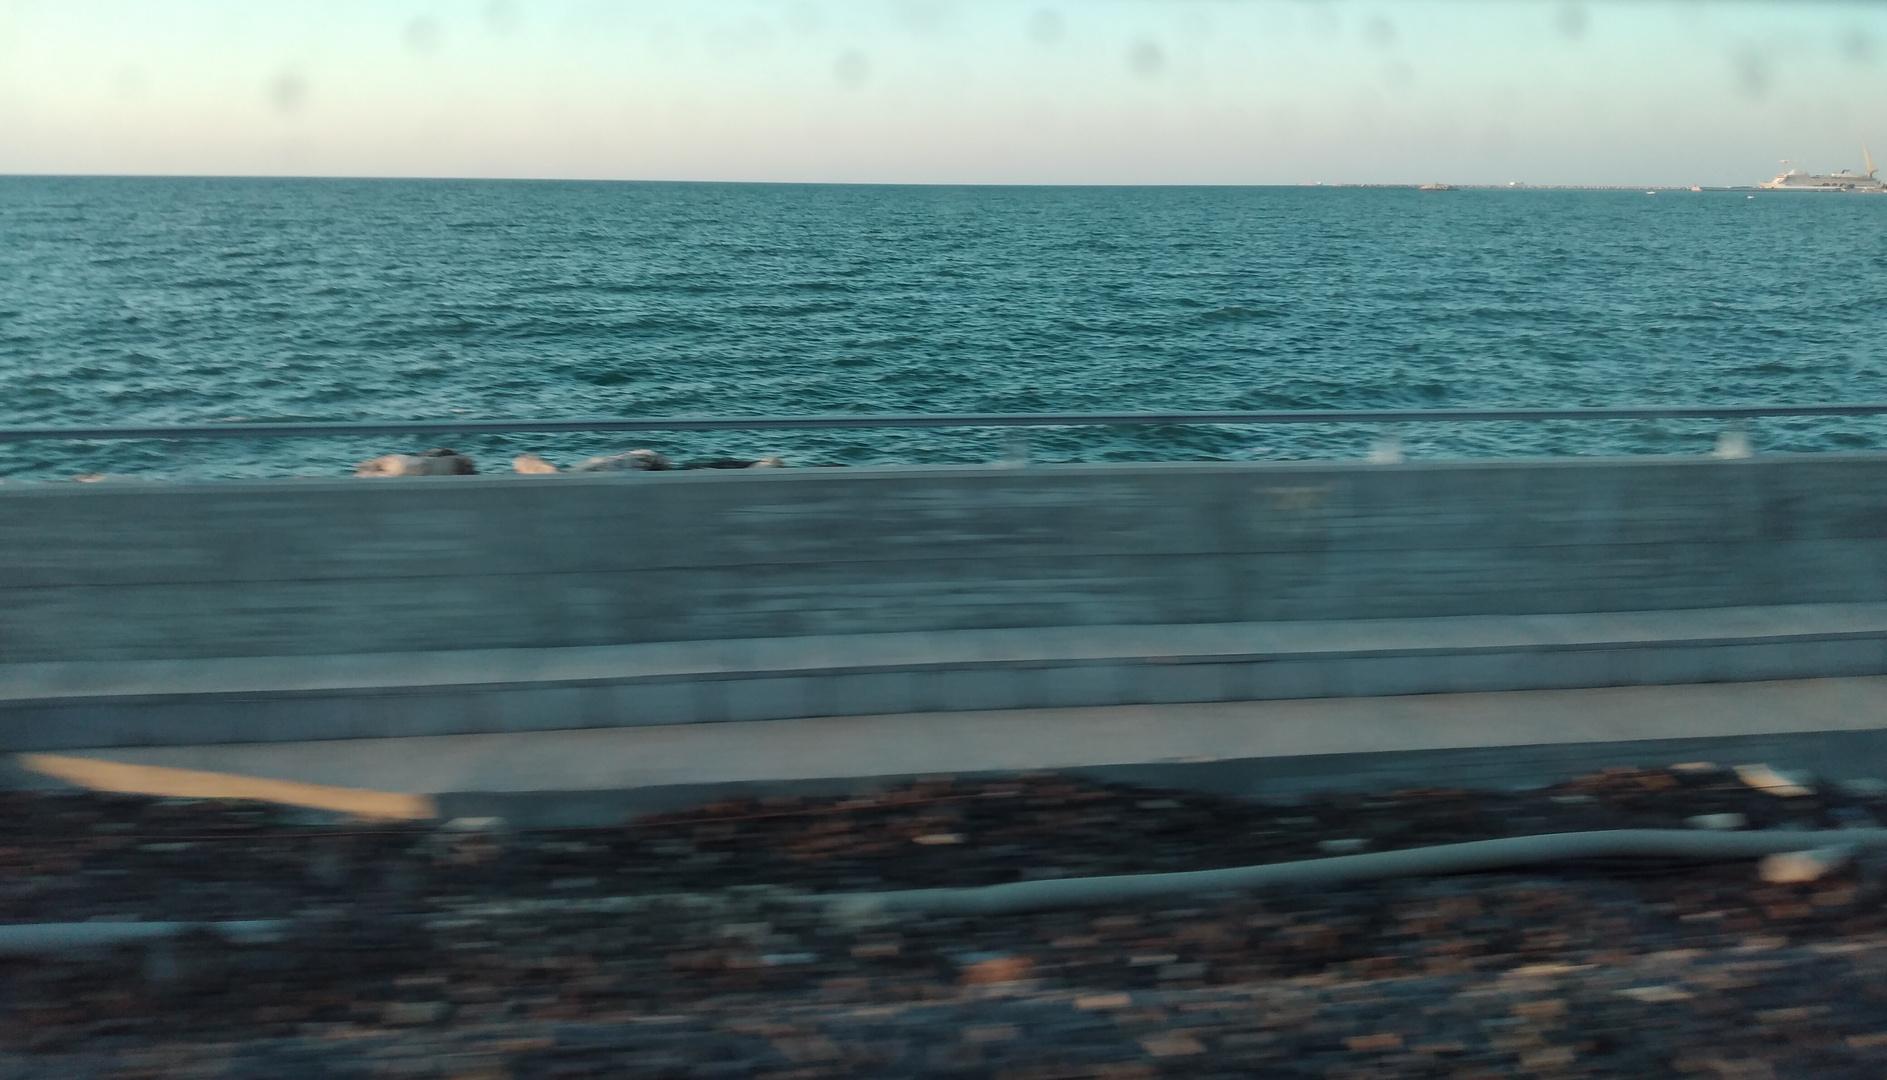 Mare Adriatico 3